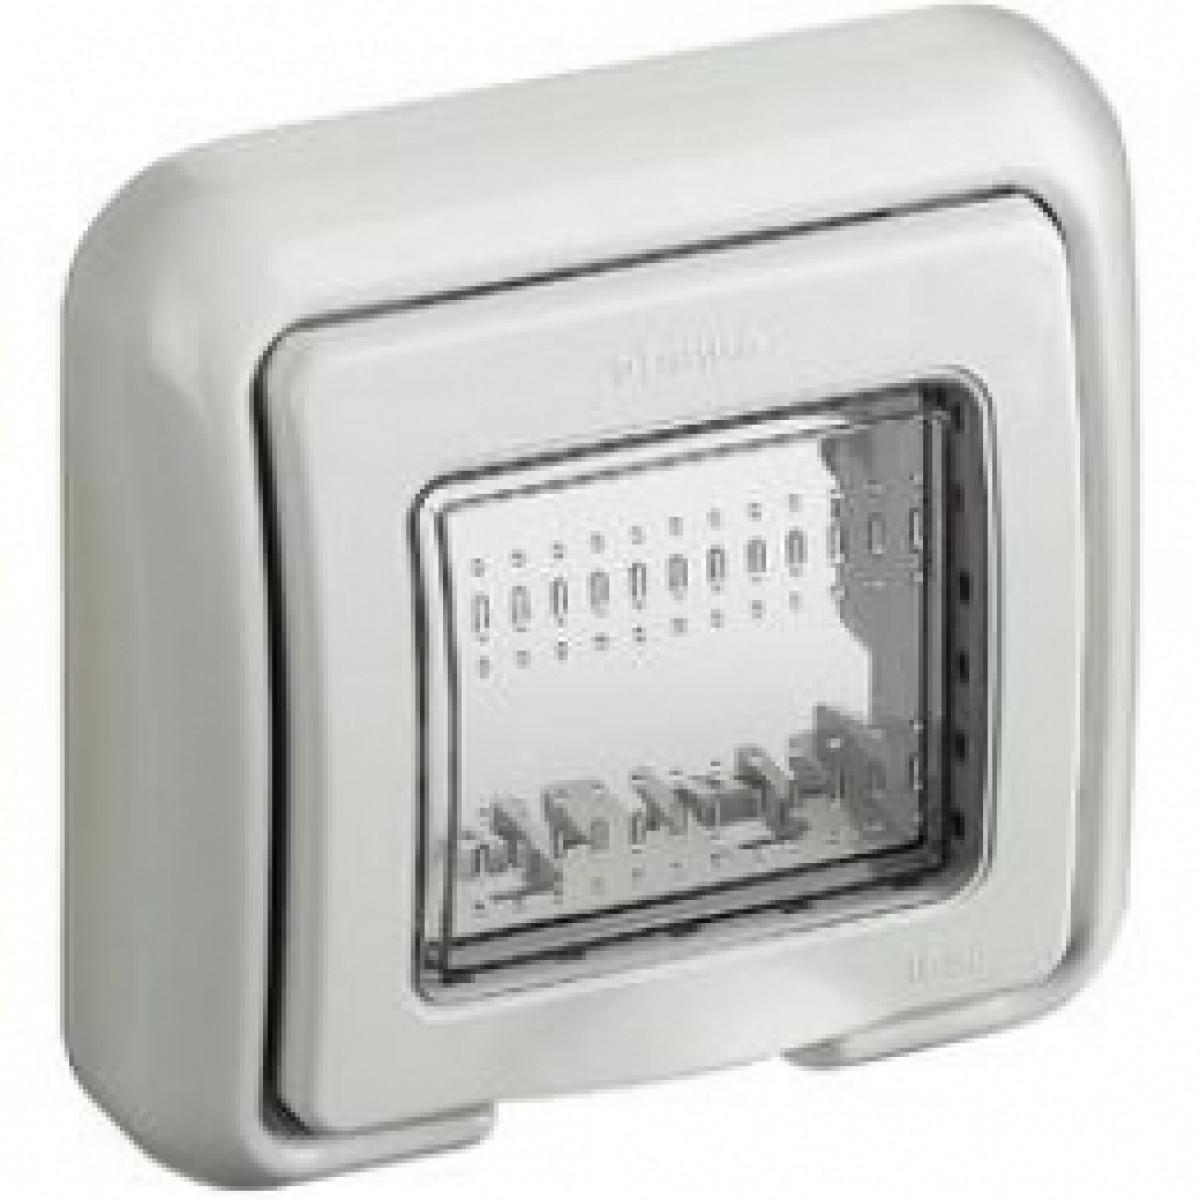 Matix bticino coperchio idrobox ip55 2 posti colore bianco 25602B